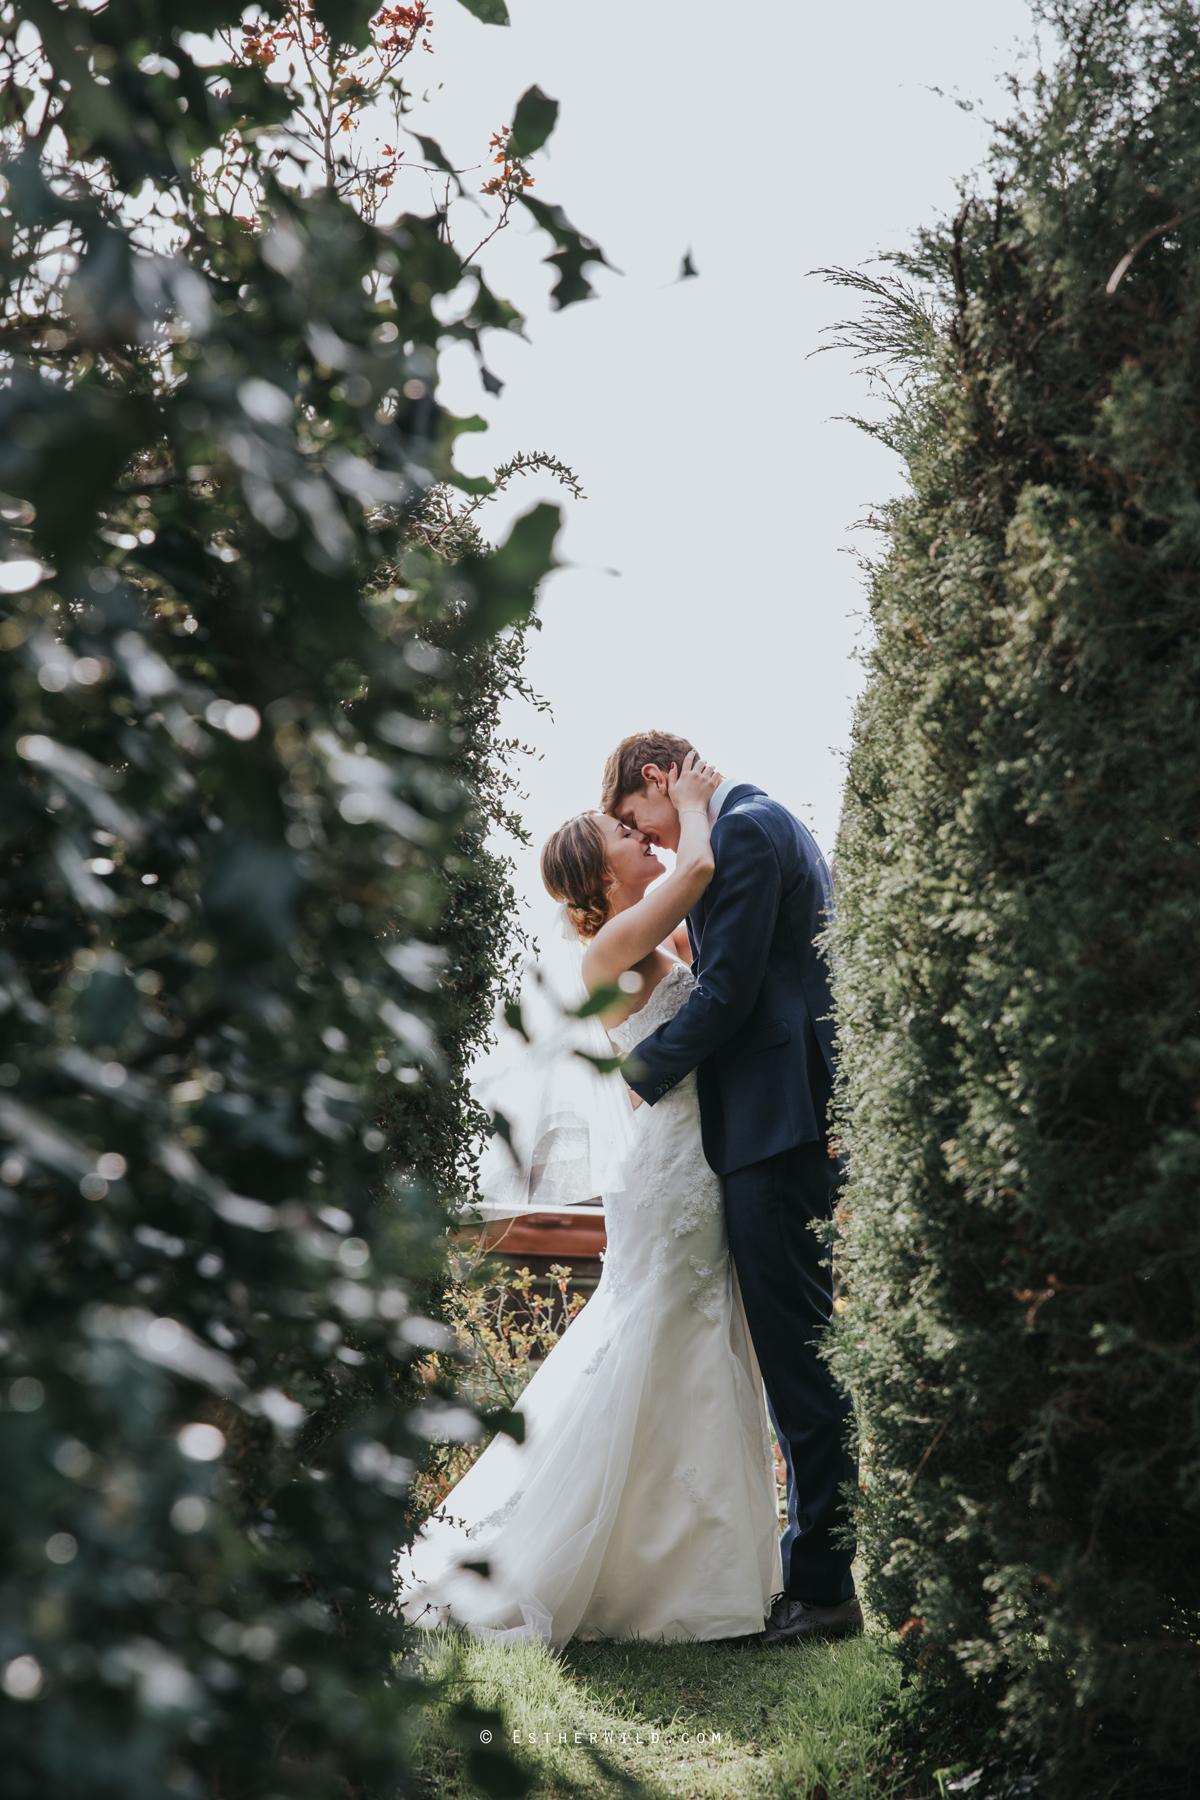 Glebe_Farm_Barn_Rustic_Norfolk_Wedding_Esther_Wild_Photographer_Copyright_IMG_1633.jpg